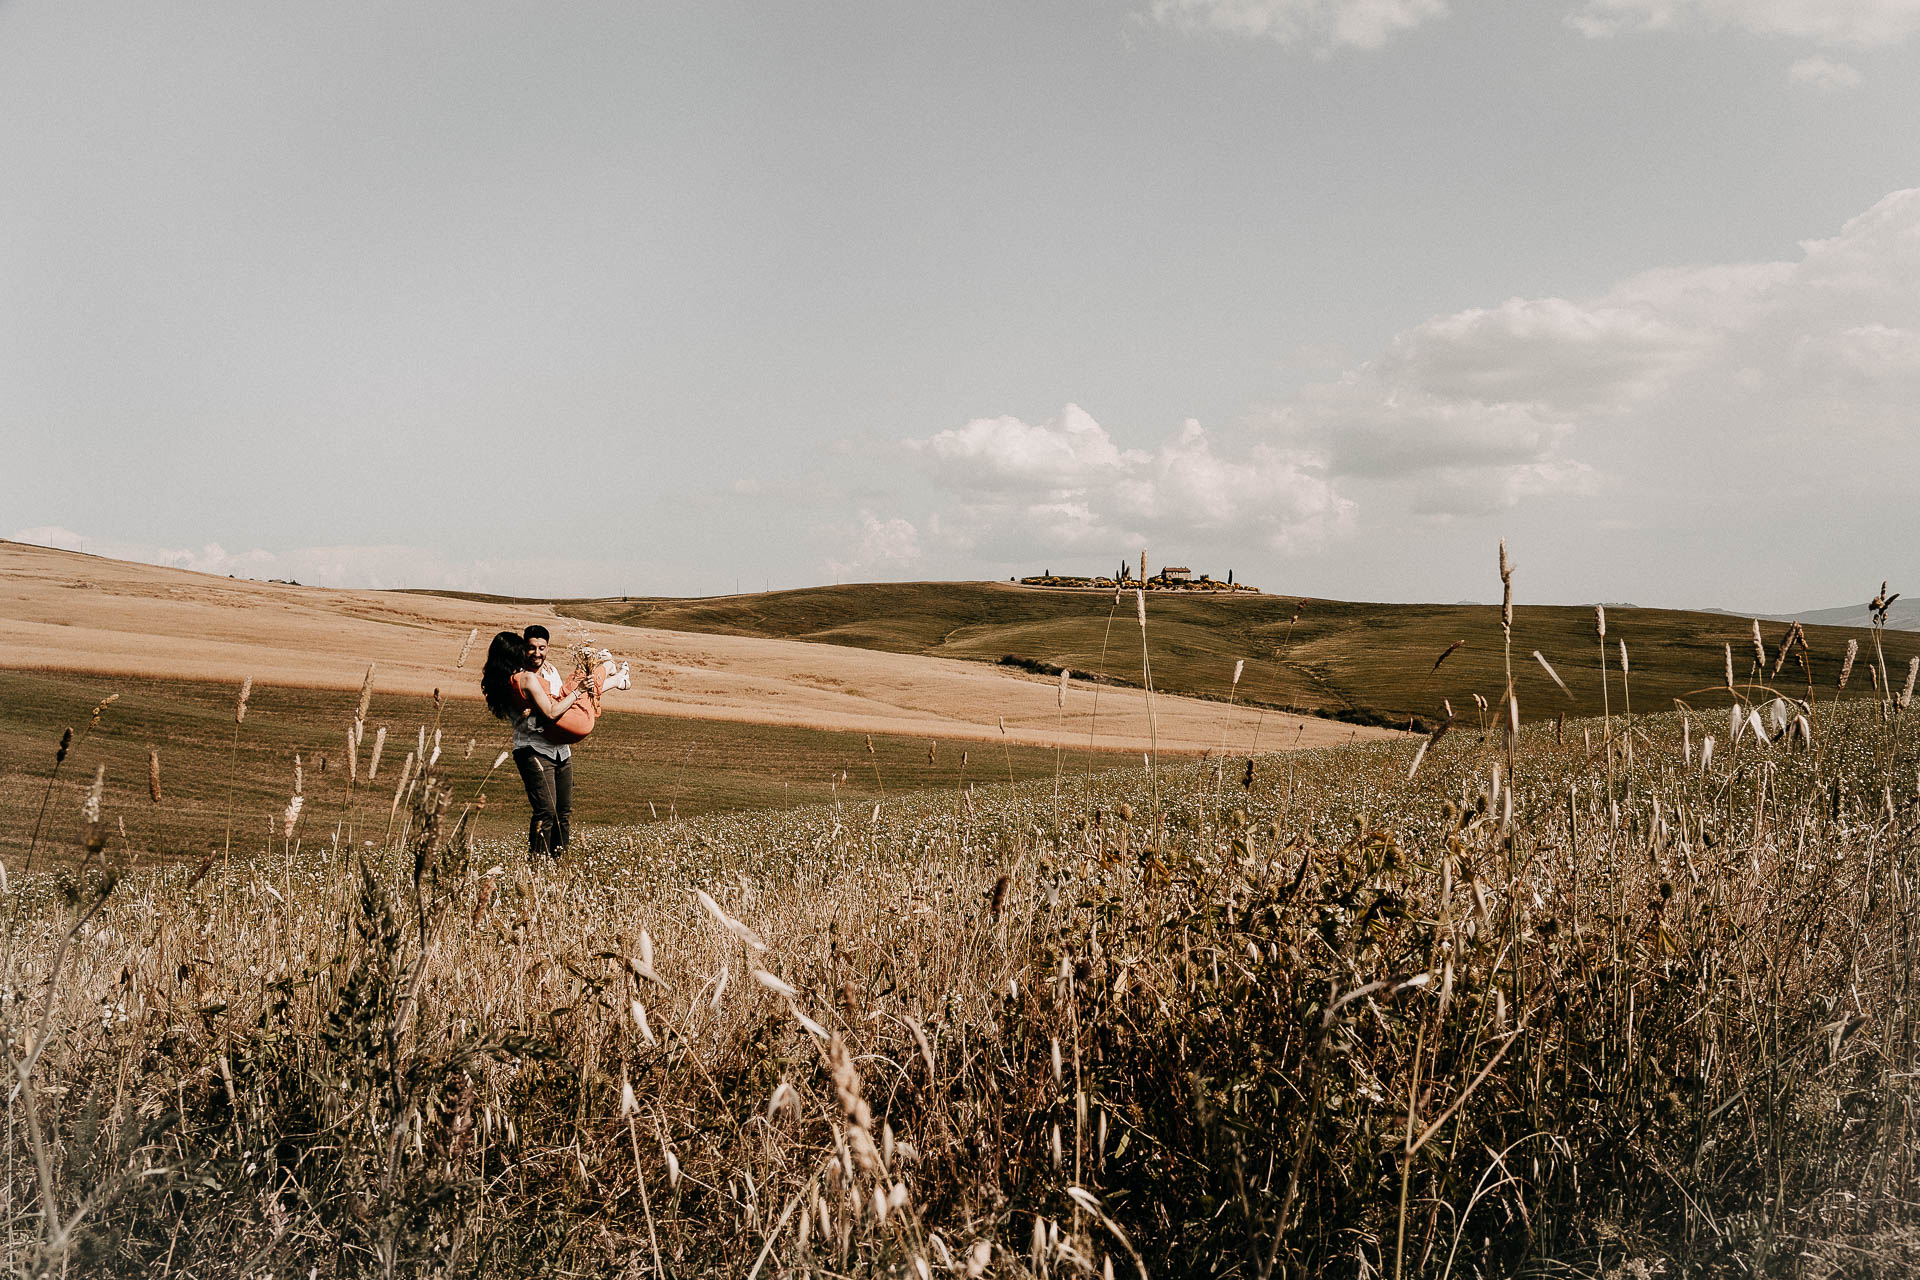 Servizio fotografico di engagement elopement